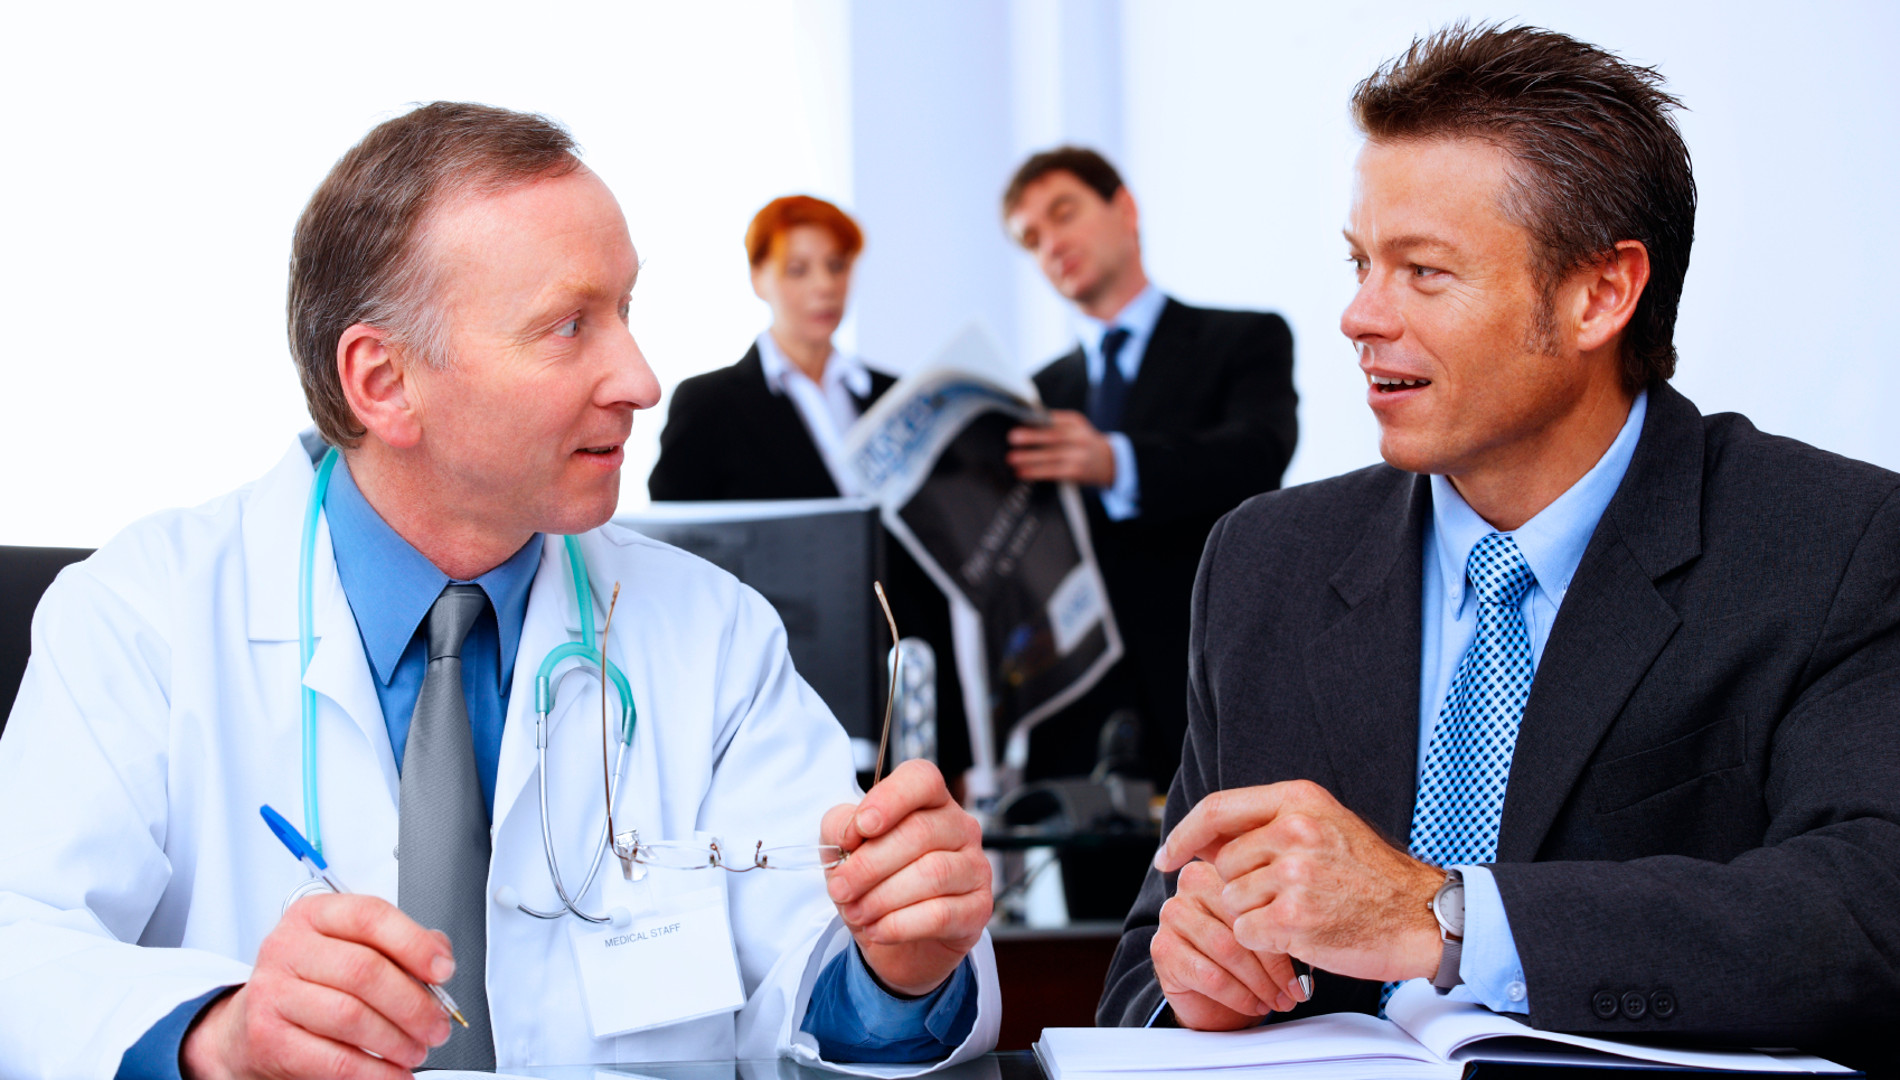 médico explicando plano de saúde empresarial para empresas